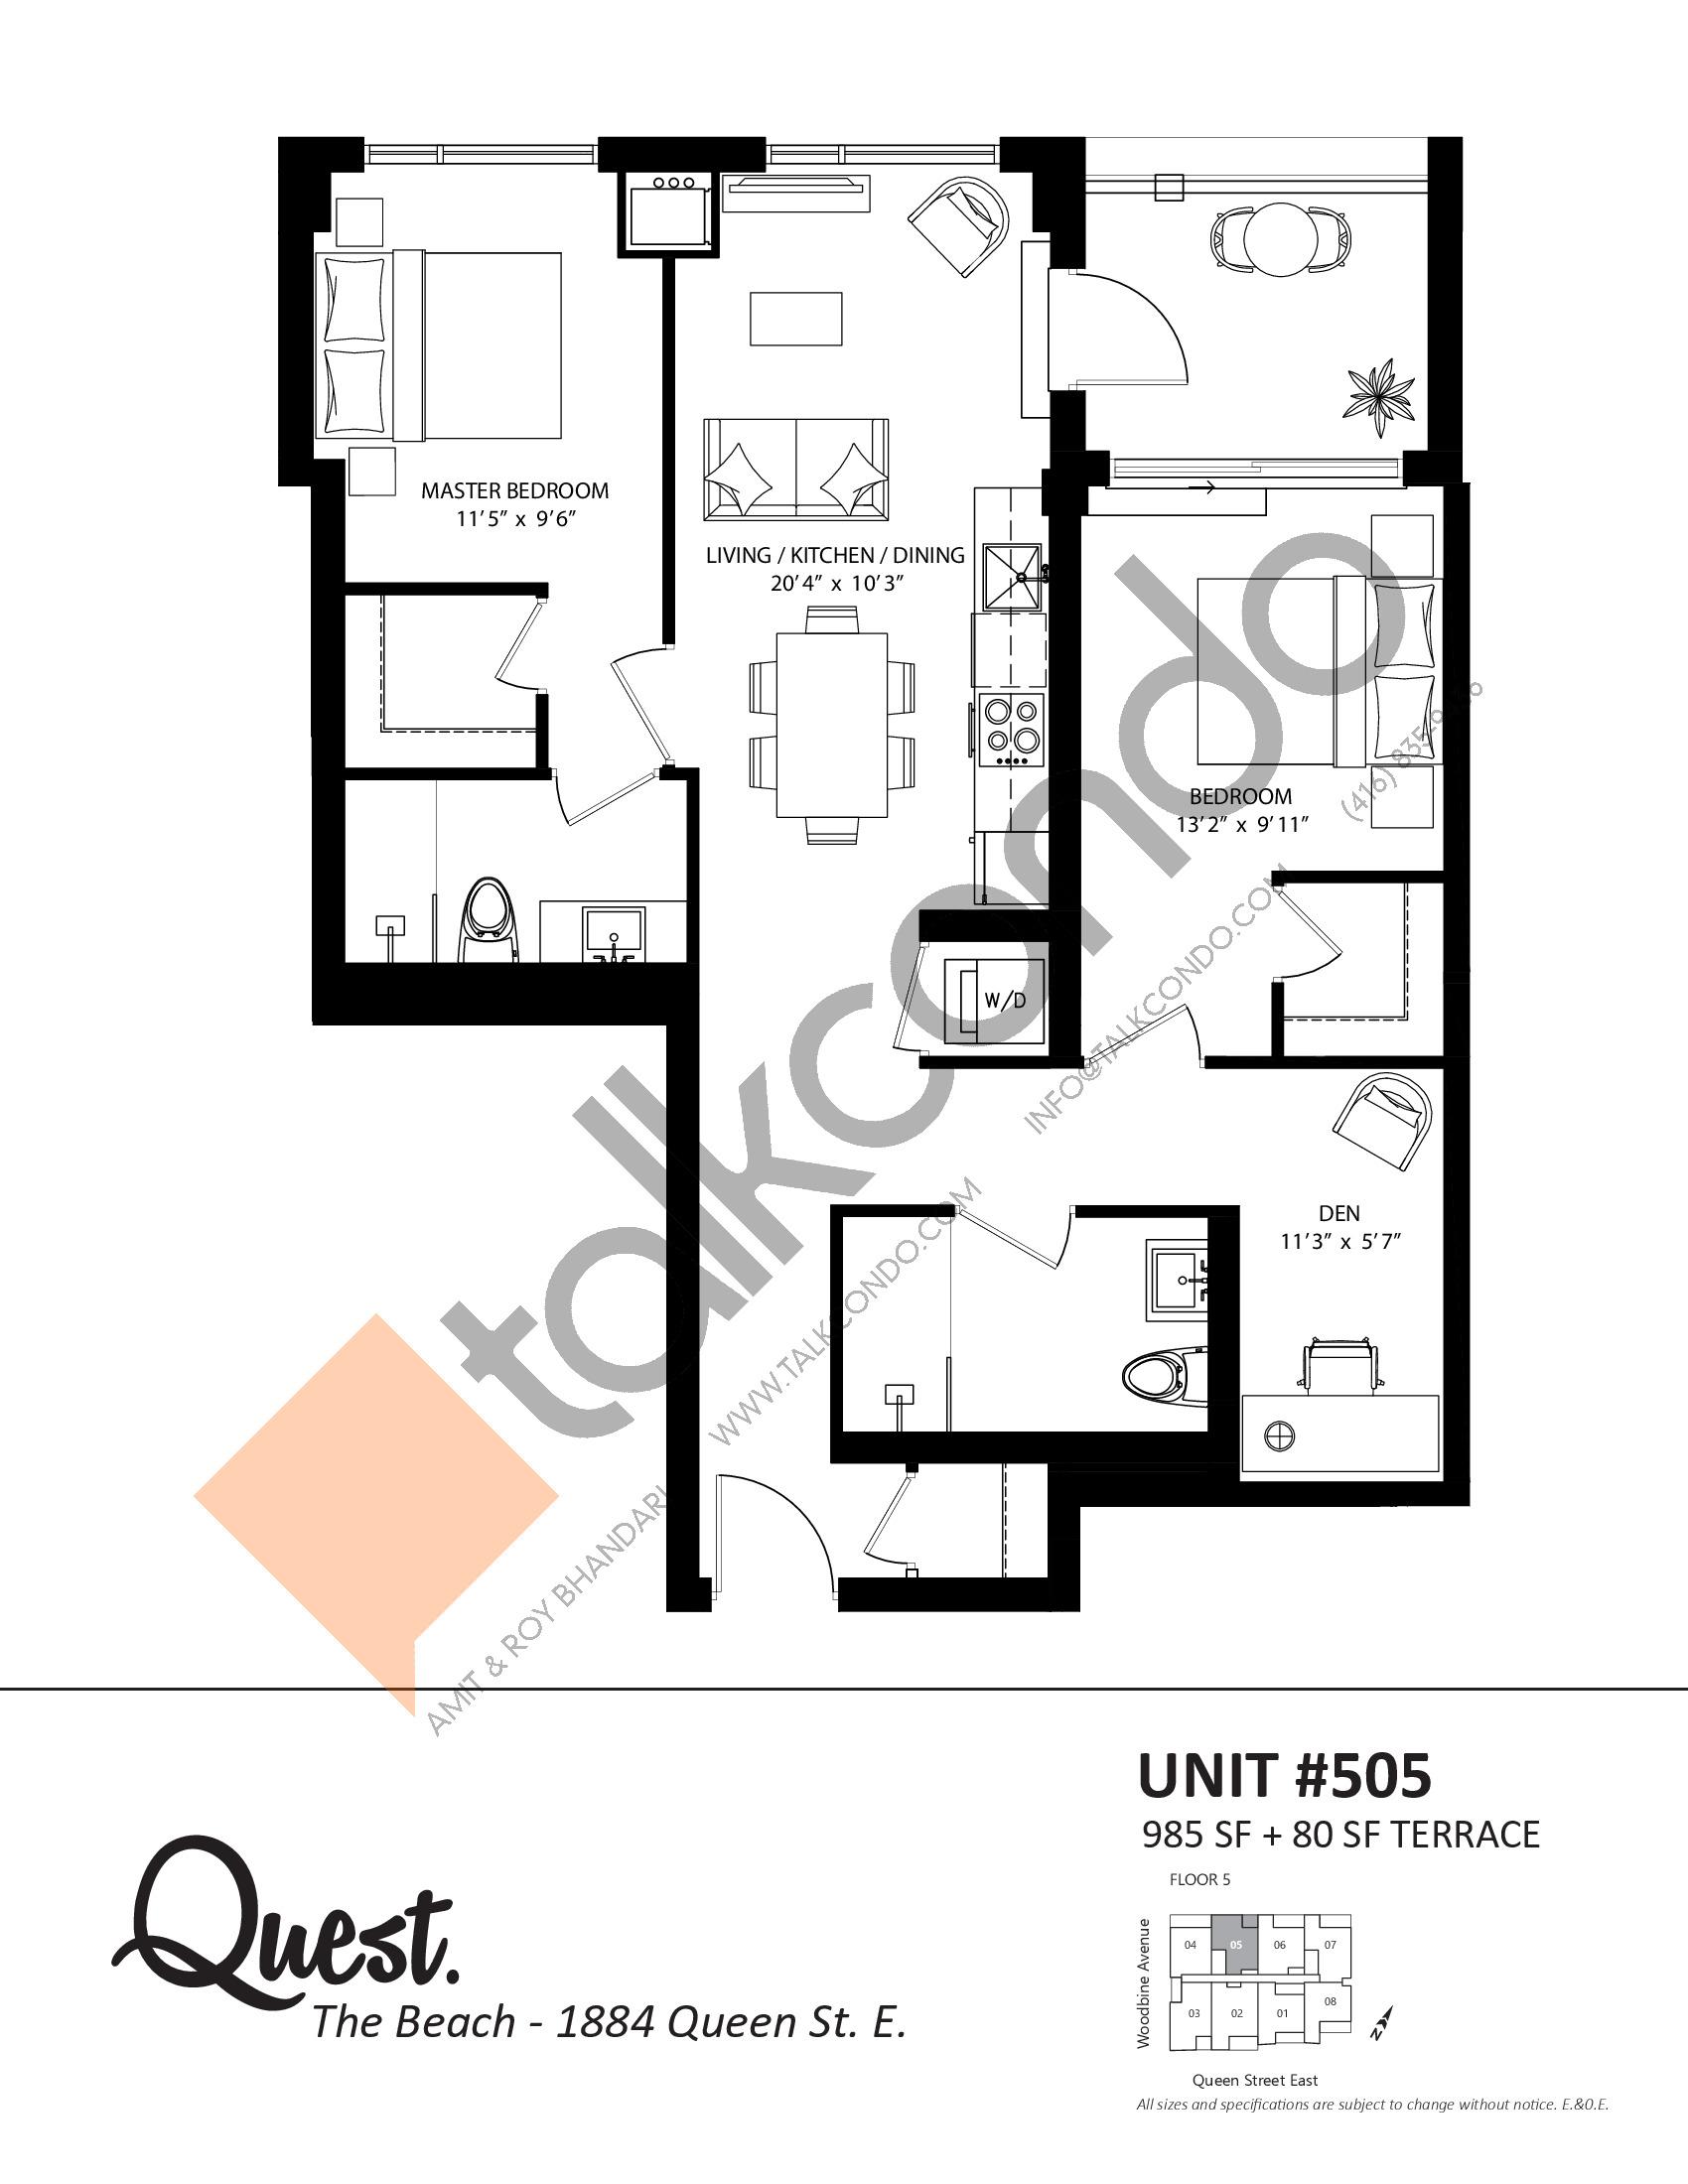 Unit 505 Floor Plan at Heartwood the Beach Condos - 985 sq.ft